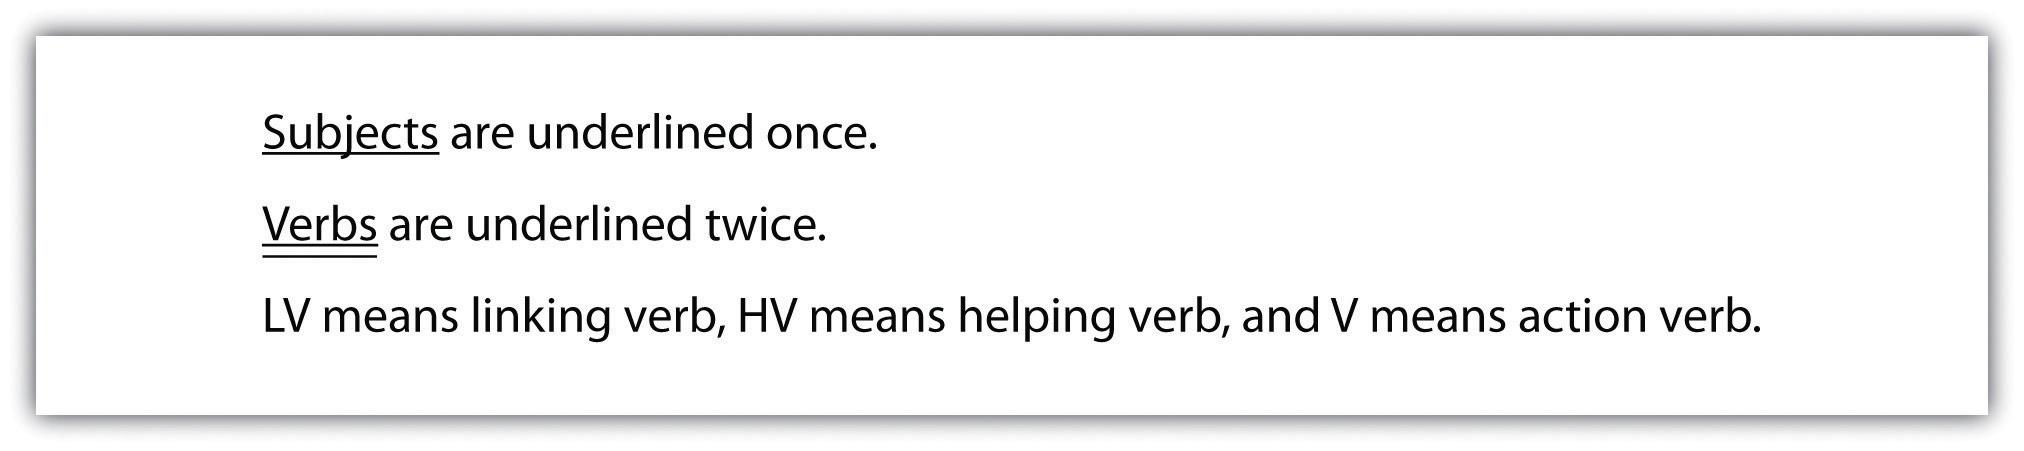 writing basics what makes a good sentence tip